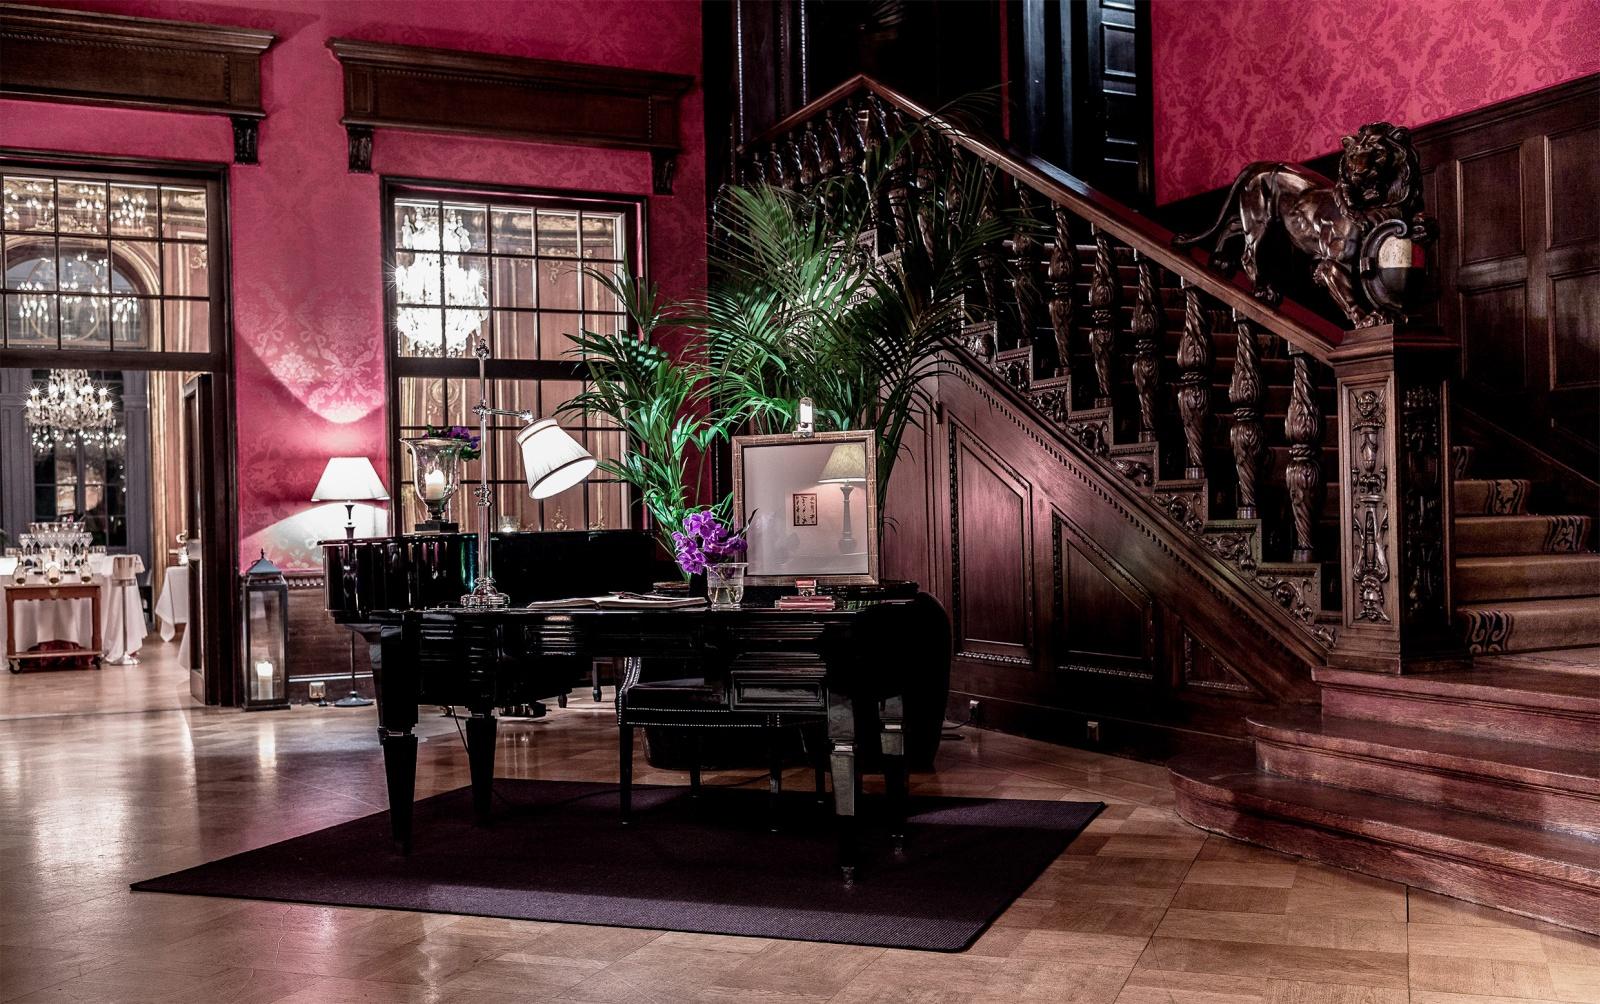 patrick hellmann schlosshotel aristocracy in berlin. Black Bedroom Furniture Sets. Home Design Ideas